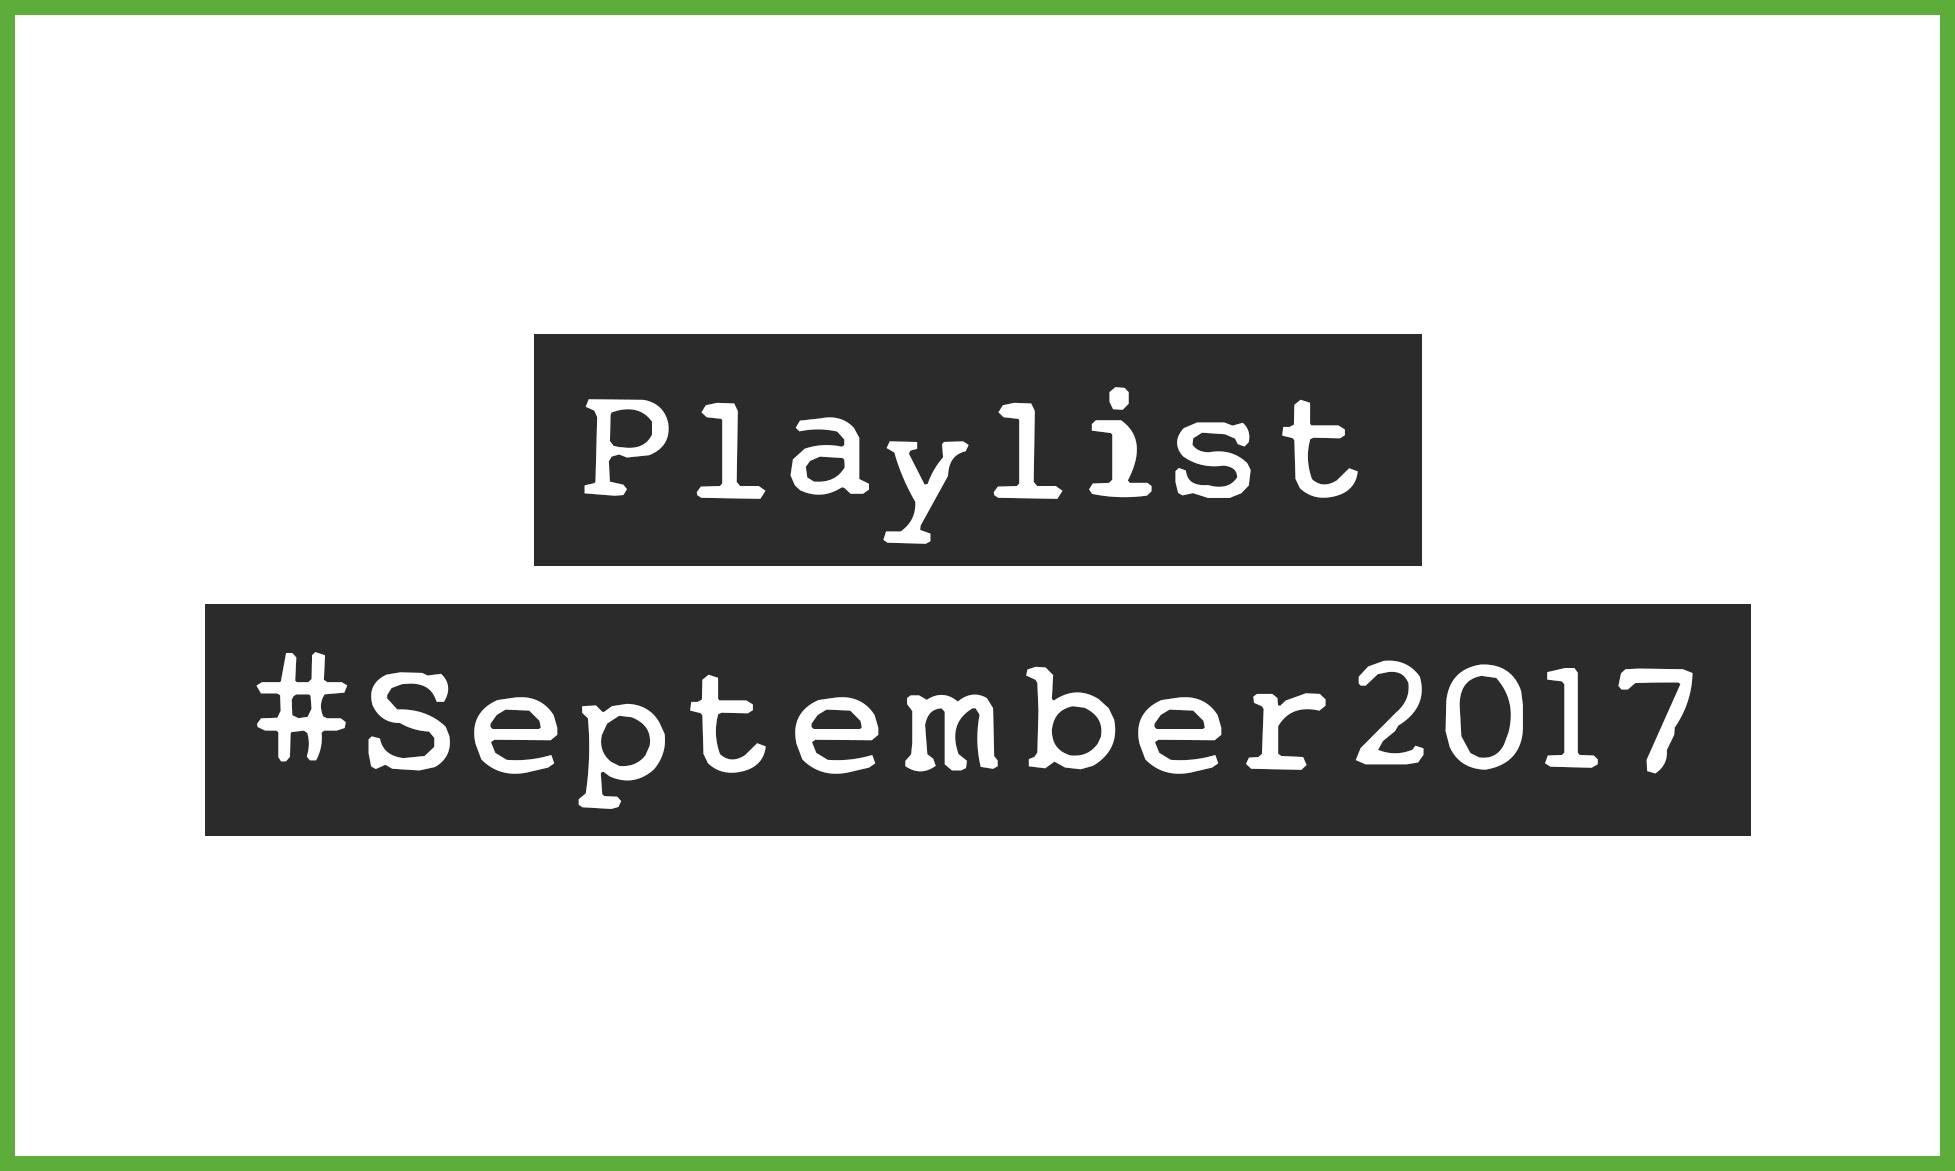 Playlist #September2017